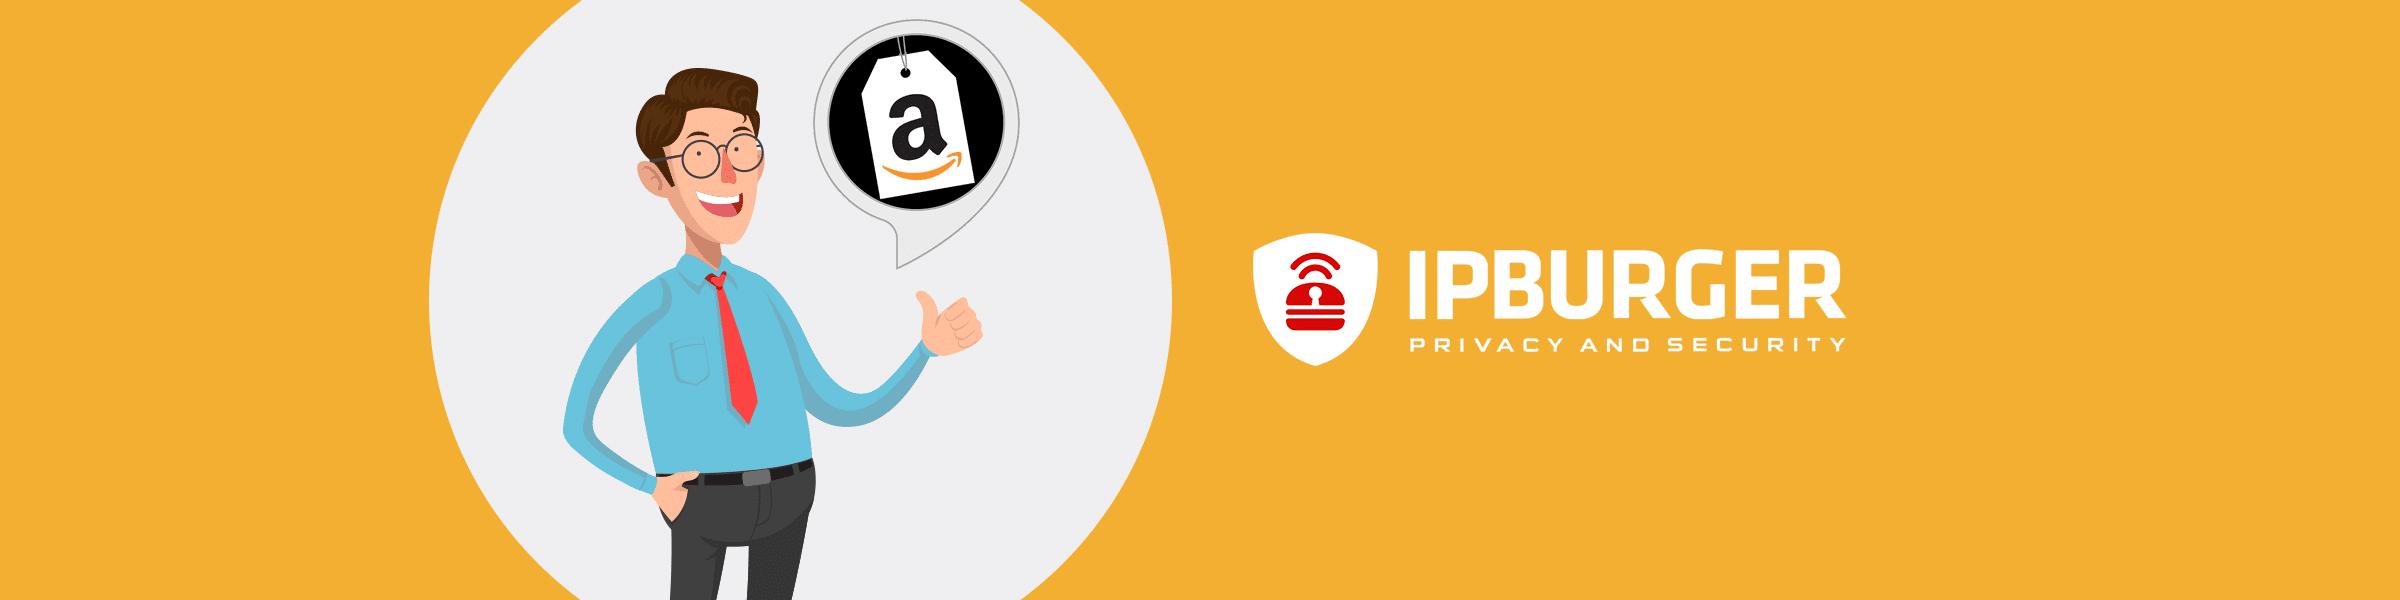 Ipburger-saved-amazon-business